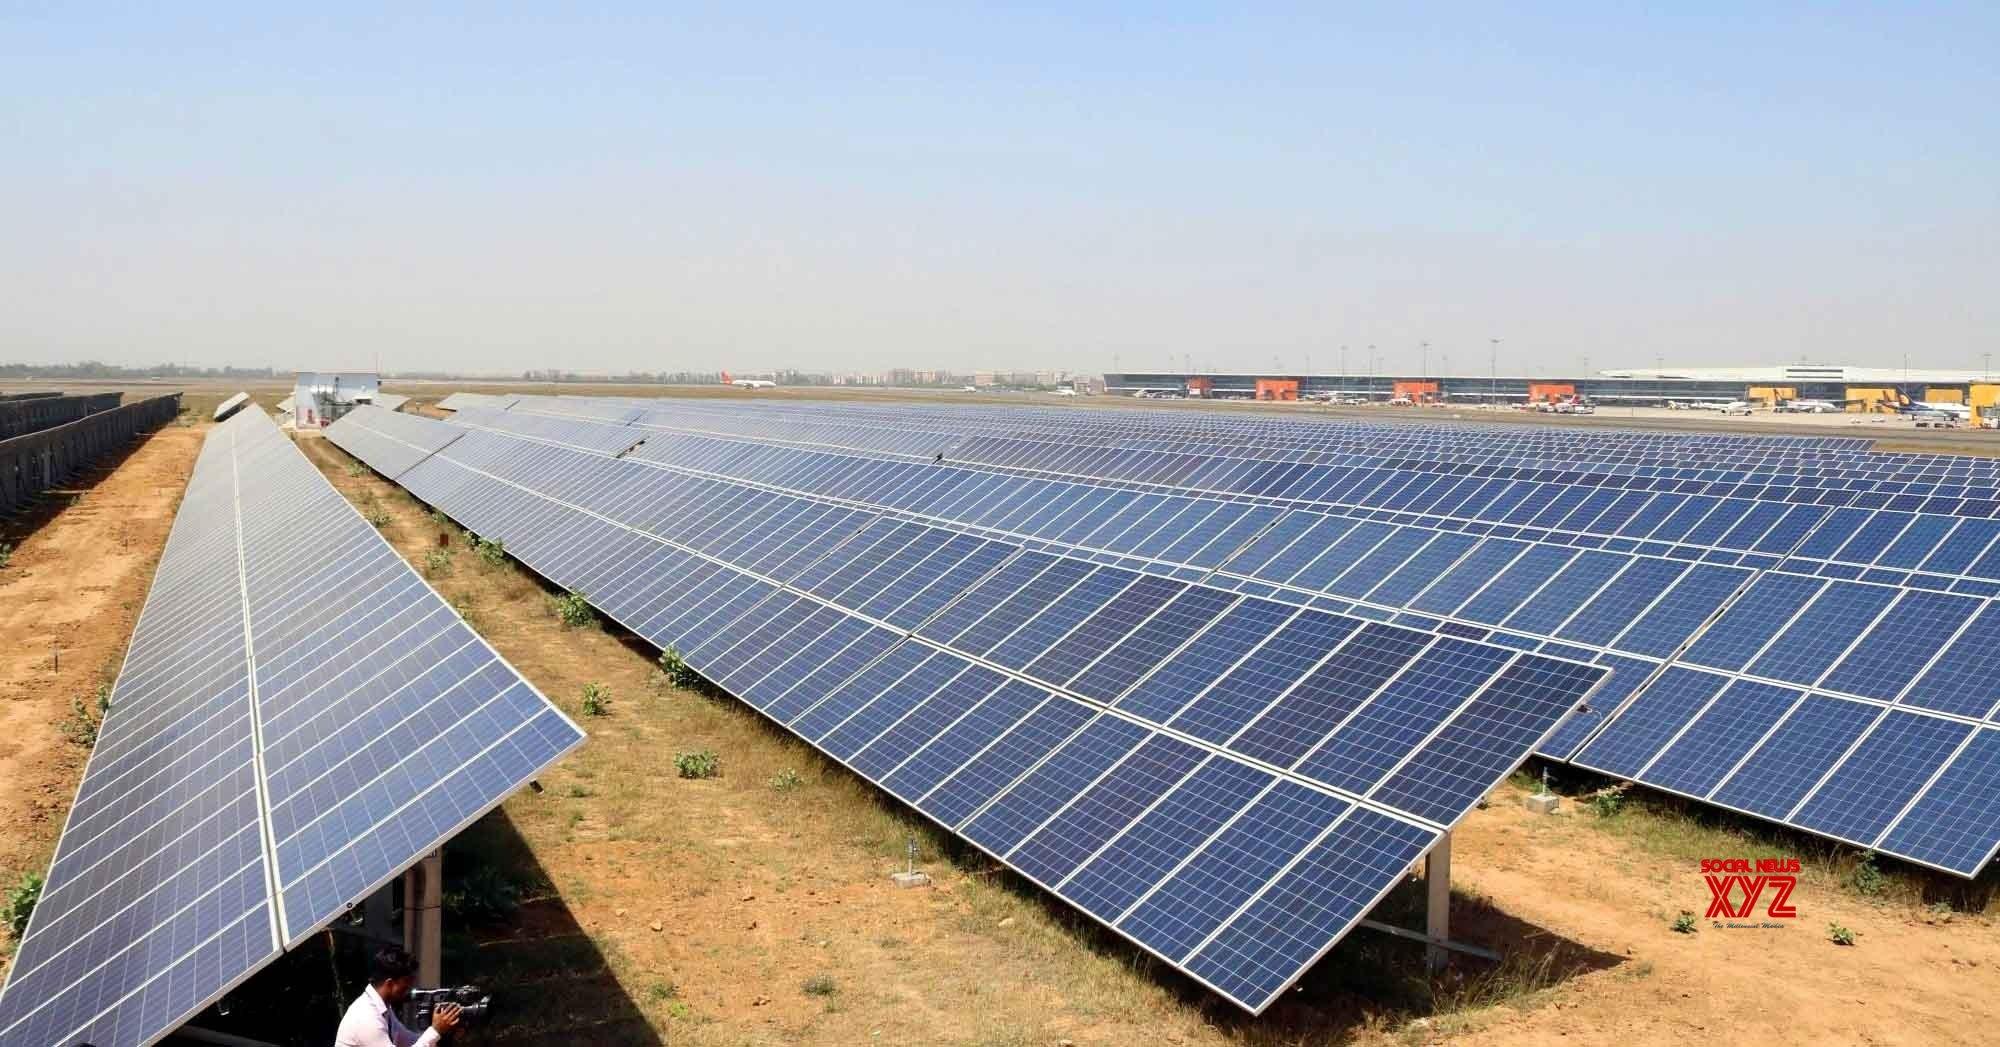 How renewable energy shift can increase 'energy poverty'